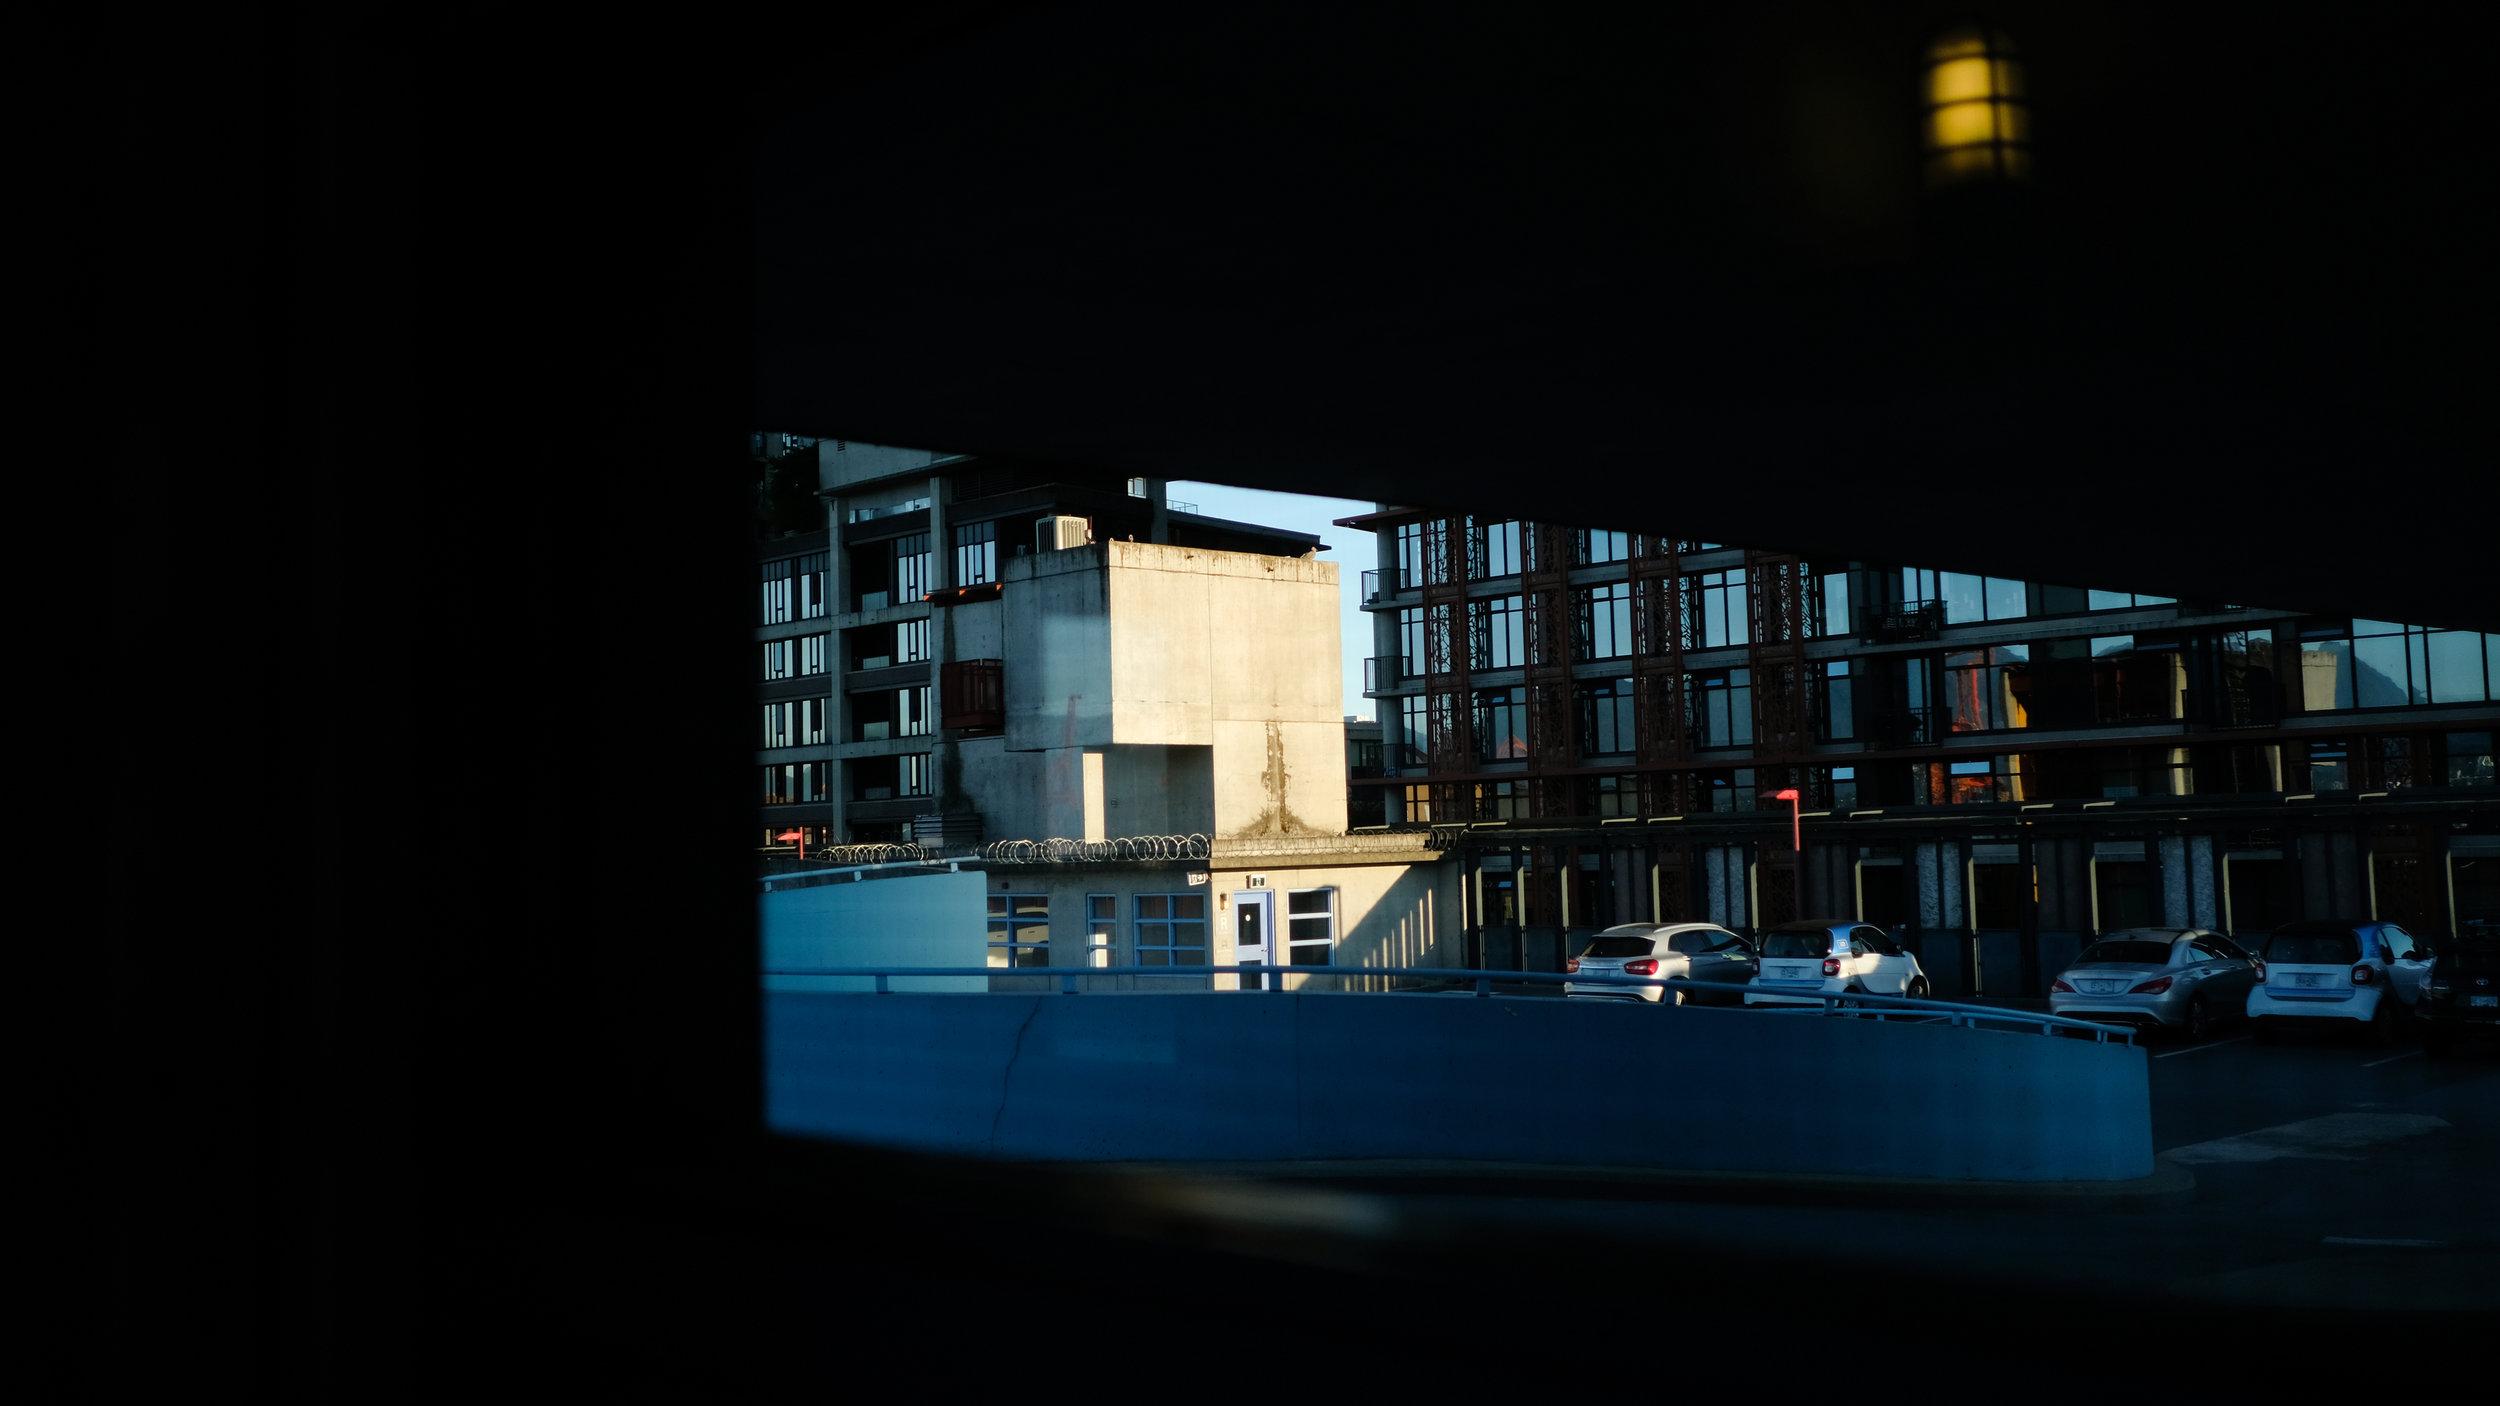 01_VANCOUVER_paring-lot.jpg